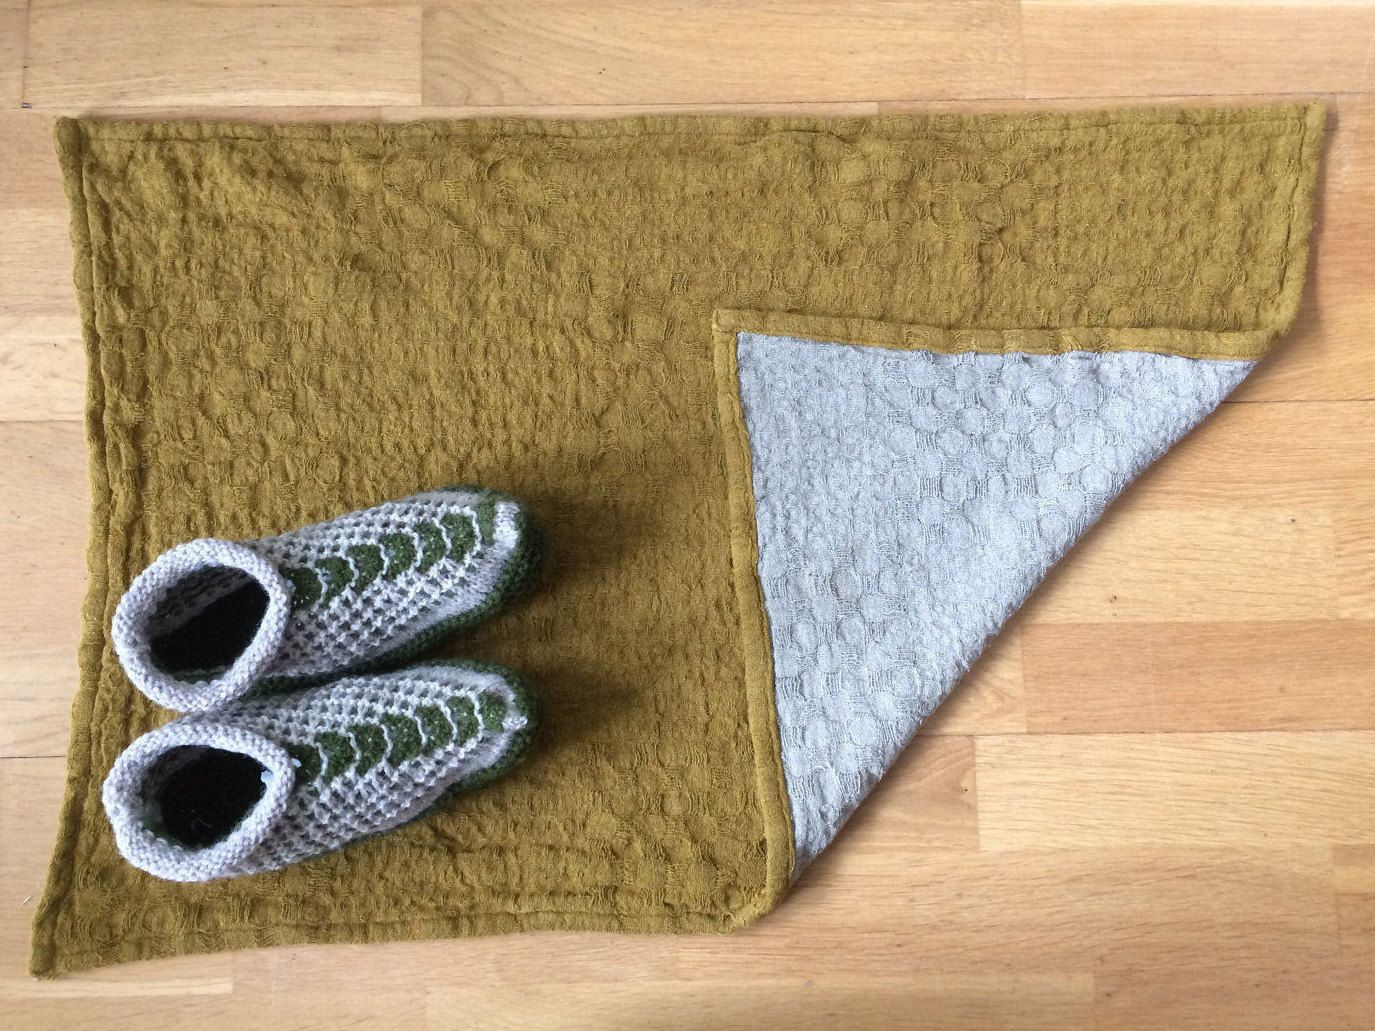 washable wholesale set bathroom floor bath mats getsubject stone grain aeproduct product